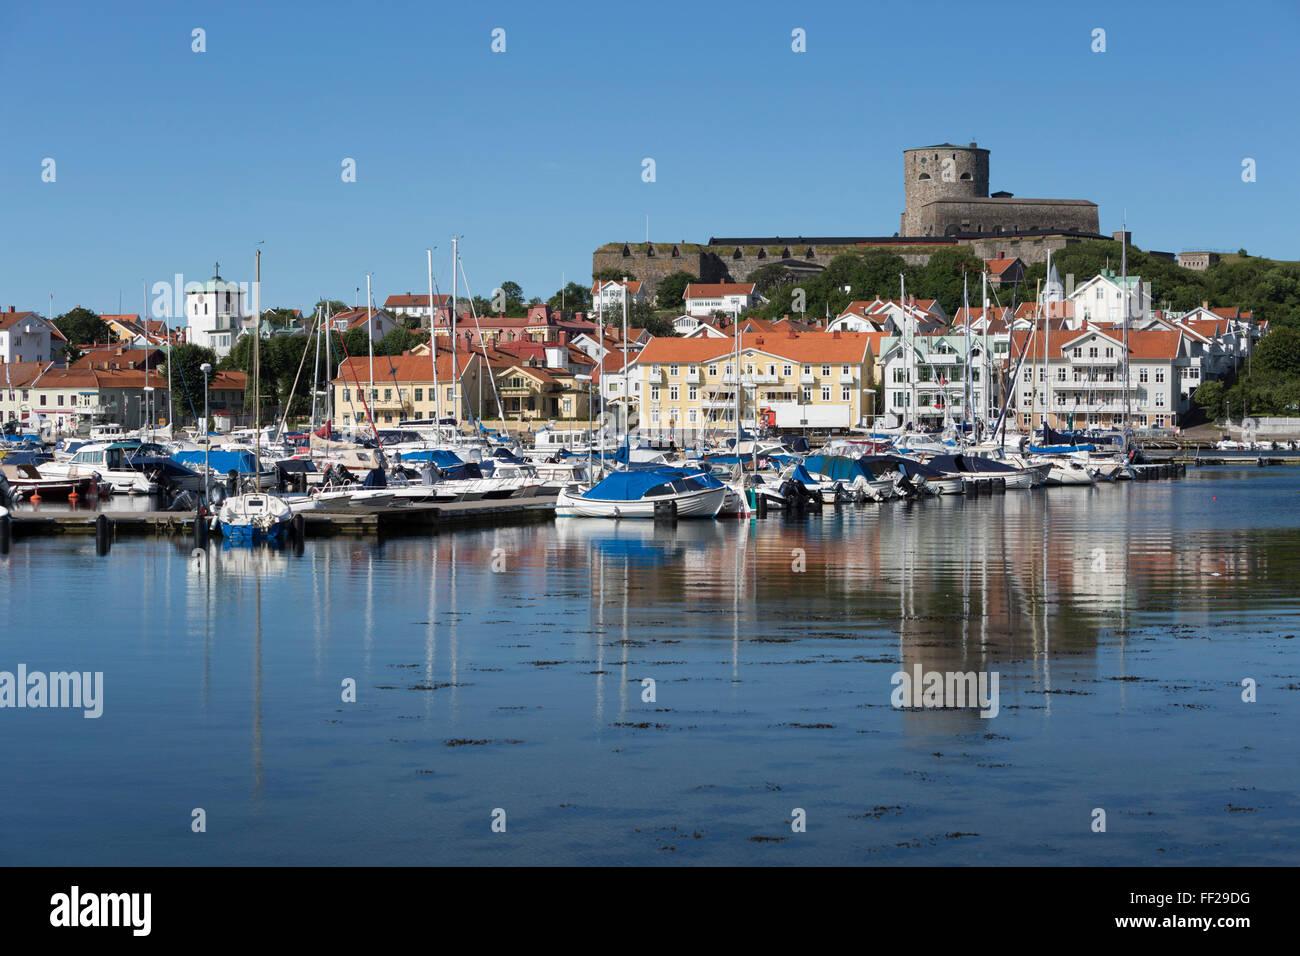 CarRMstens fortress and harbour, Marstrand, BohusRMan Coast, southwest Sweden, Sweden, Scandinavia, Europe - Stock Image